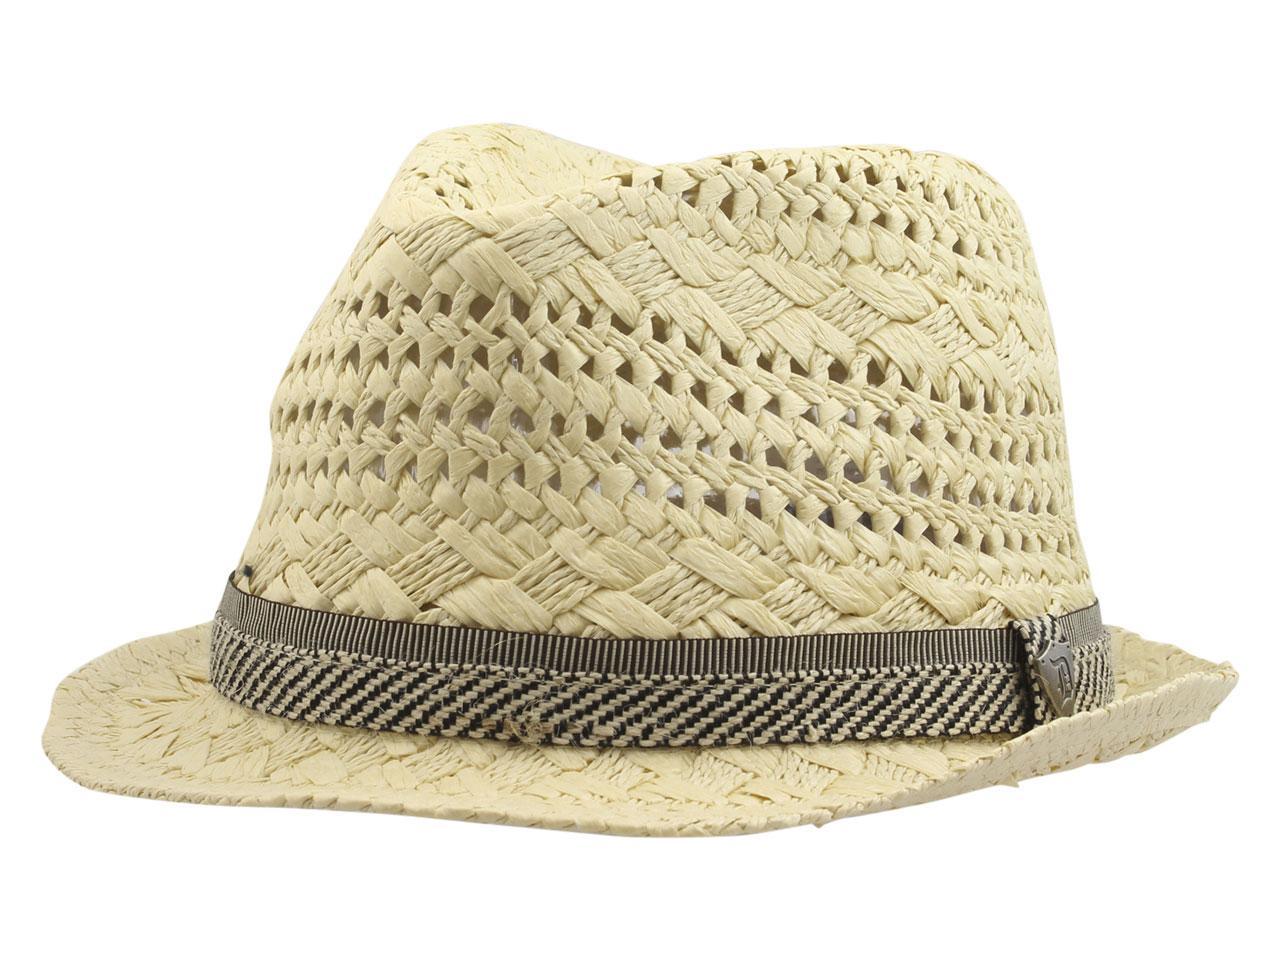 Dorfman Pacific Men s Fancy Weave Toyo Fedora Hat 636a1e70f49